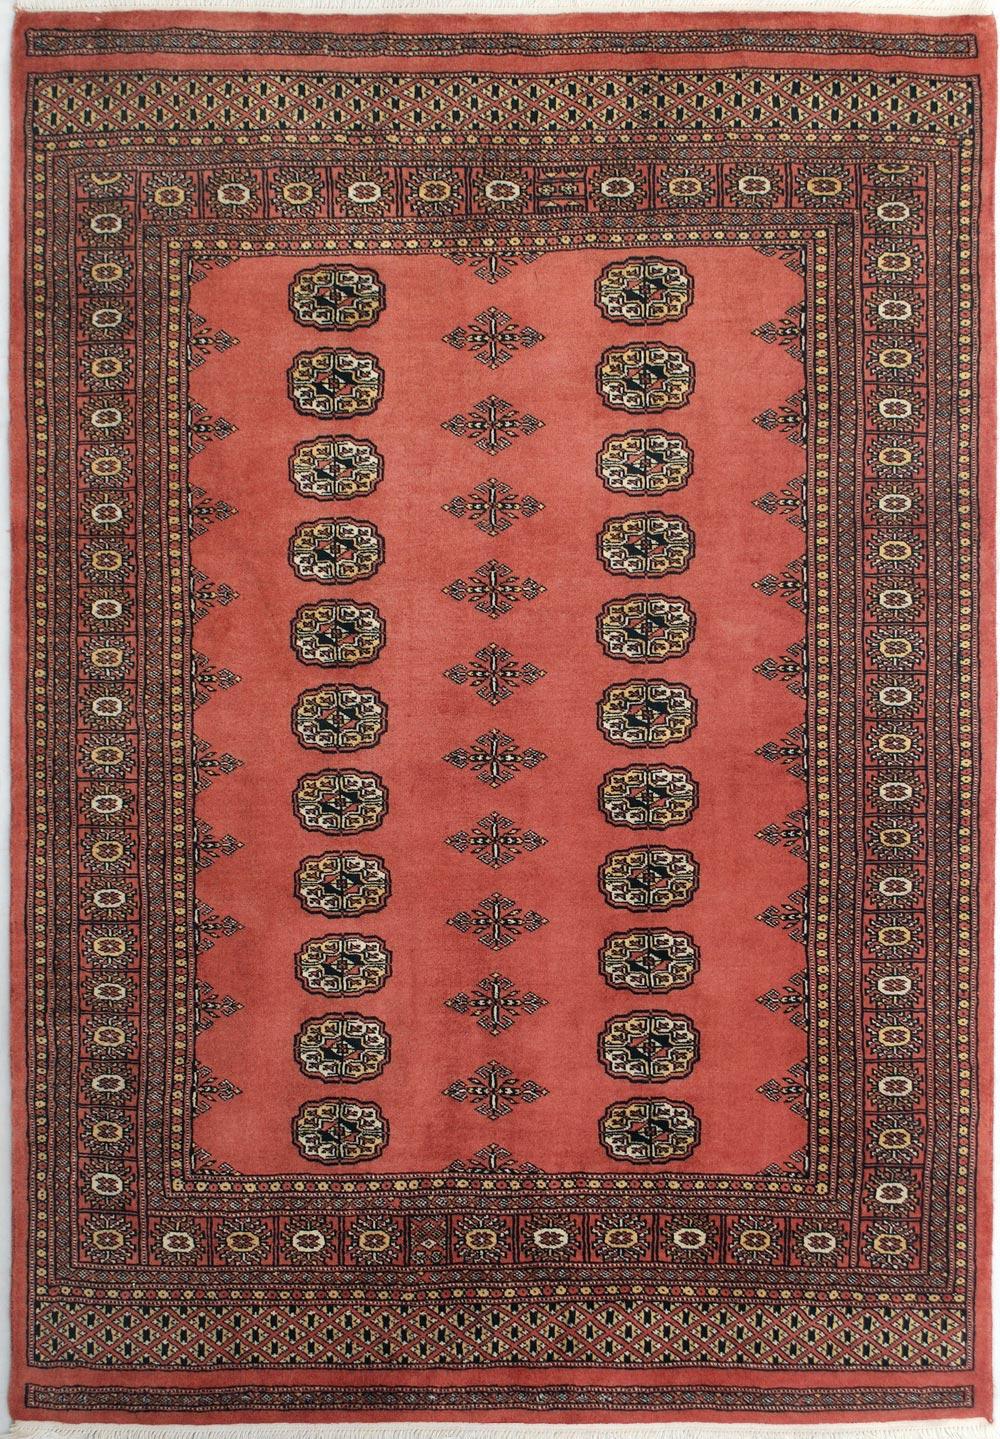 Pakistan Rug, Turkaman Rug, Turkaman Carpet, Turkmen, Oriental Rug